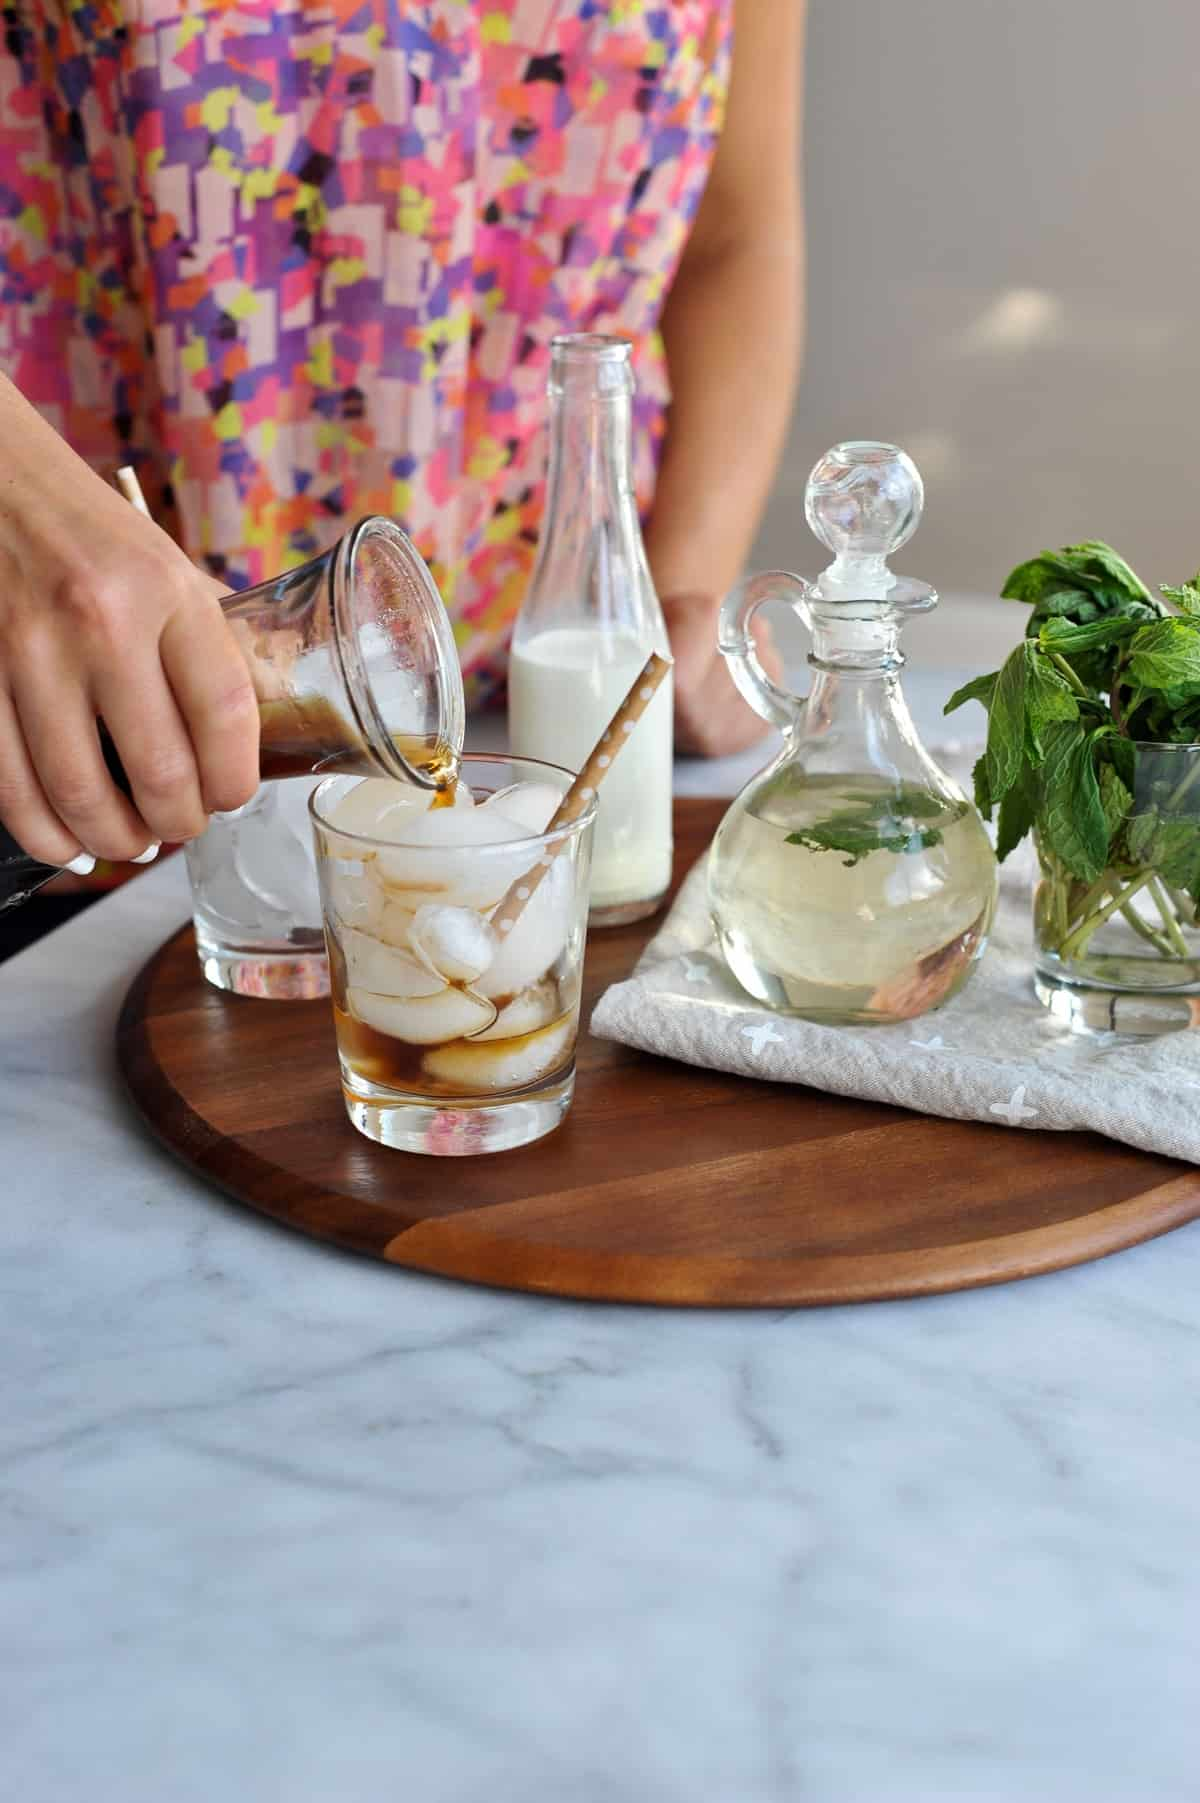 homemade mint iced coffee via @mystylevita [My Style Vita]